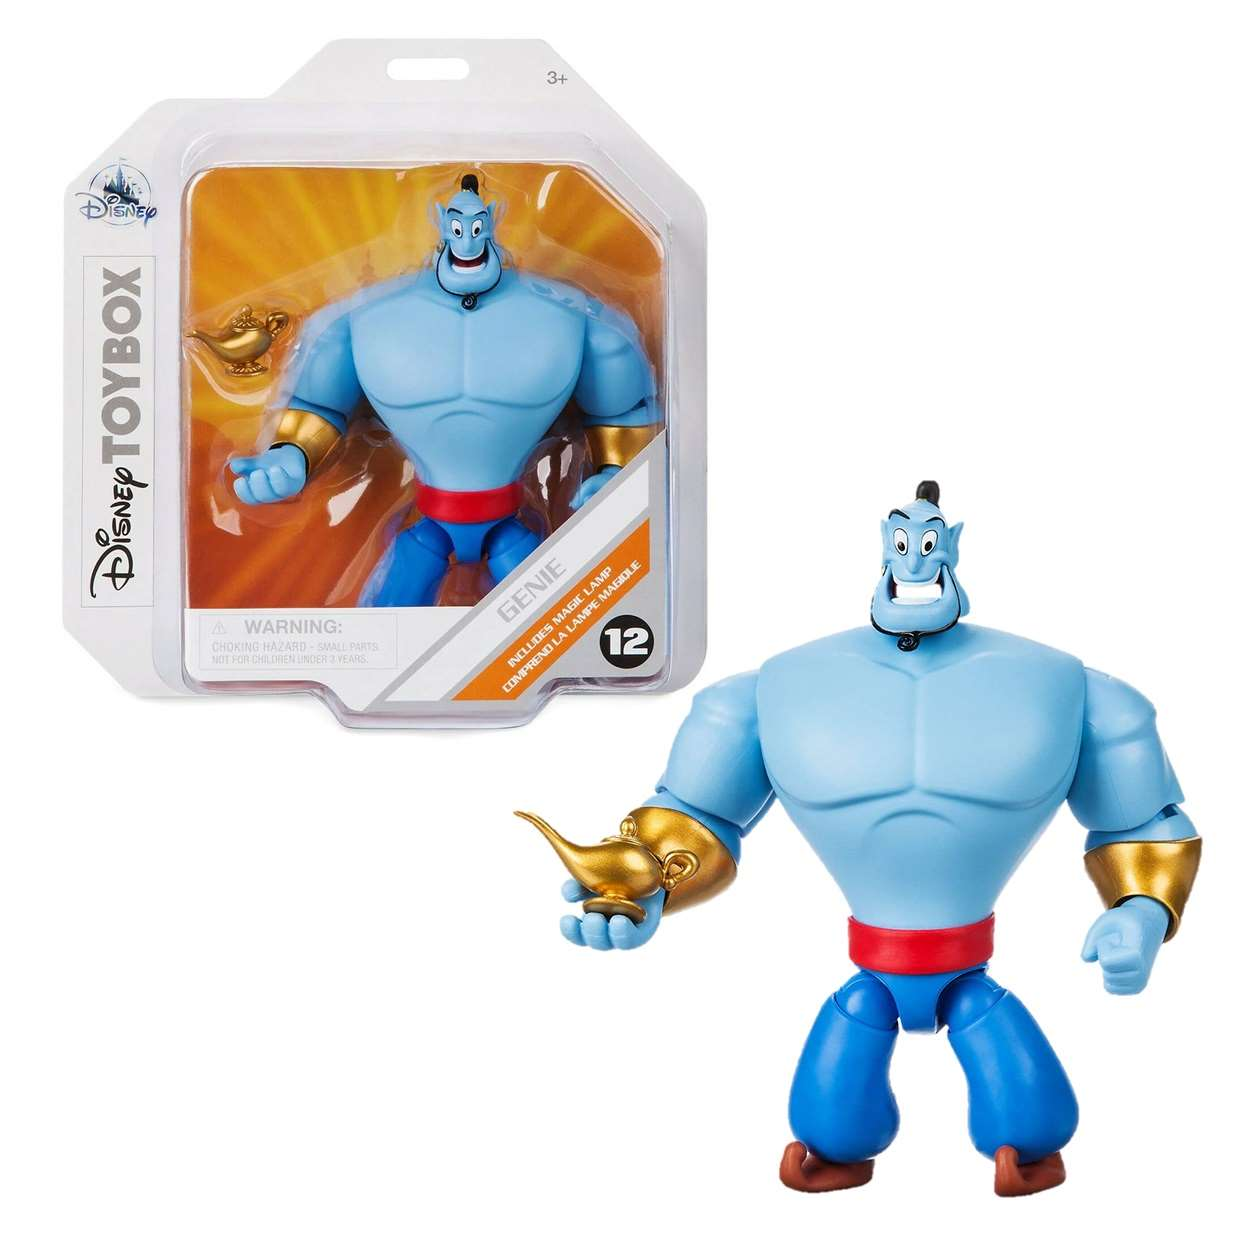 Genie Includes Magic Lamp #12 Figura Disney Toybox